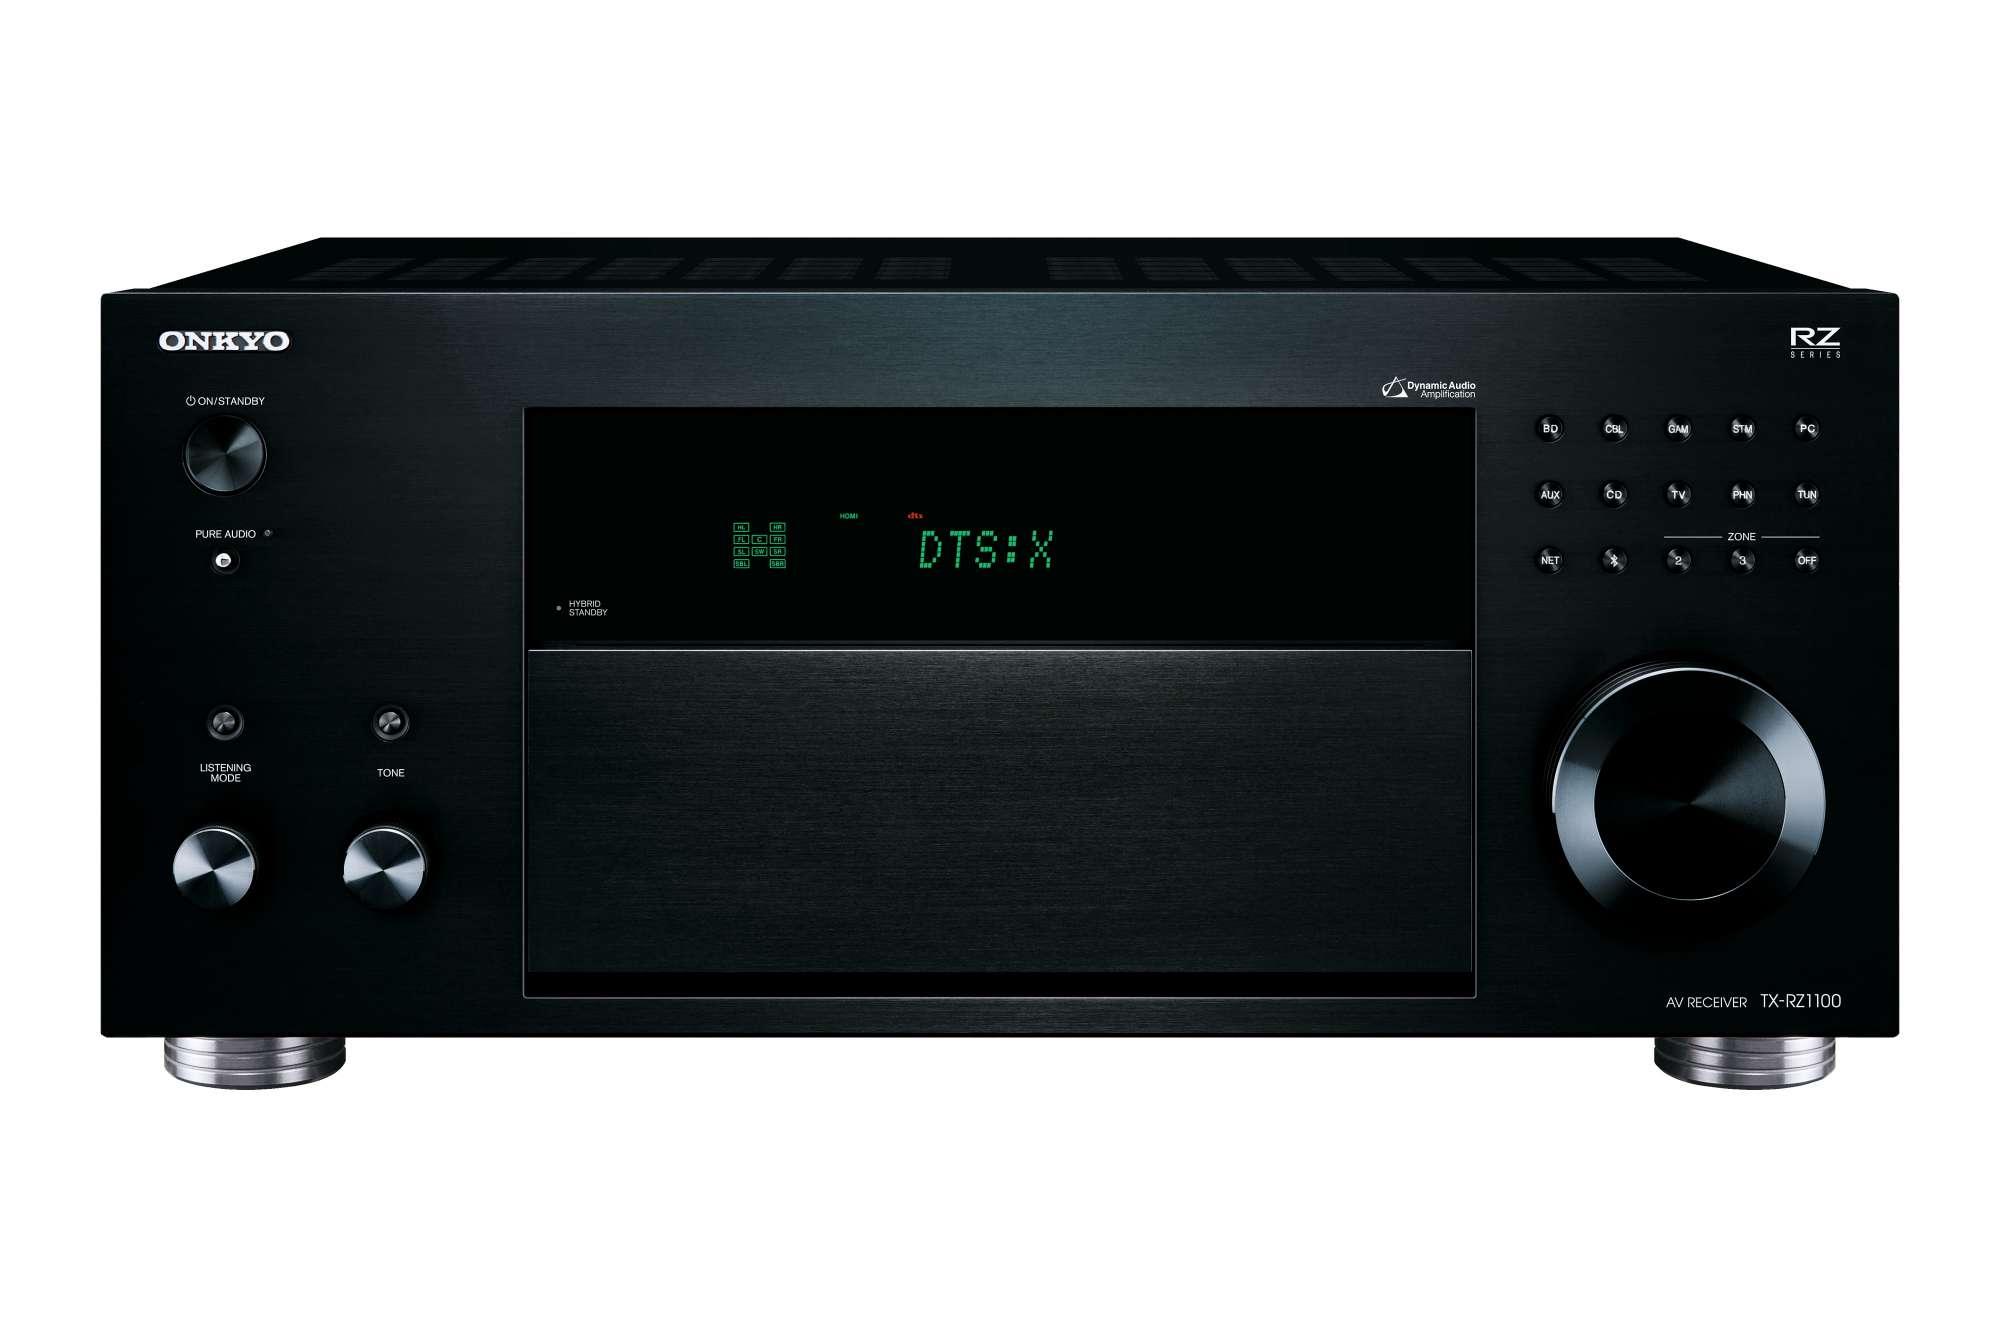 Onkyo TX-RZ1100 Netzwerk 9.2-Kanal-AV-Receiver schwarz